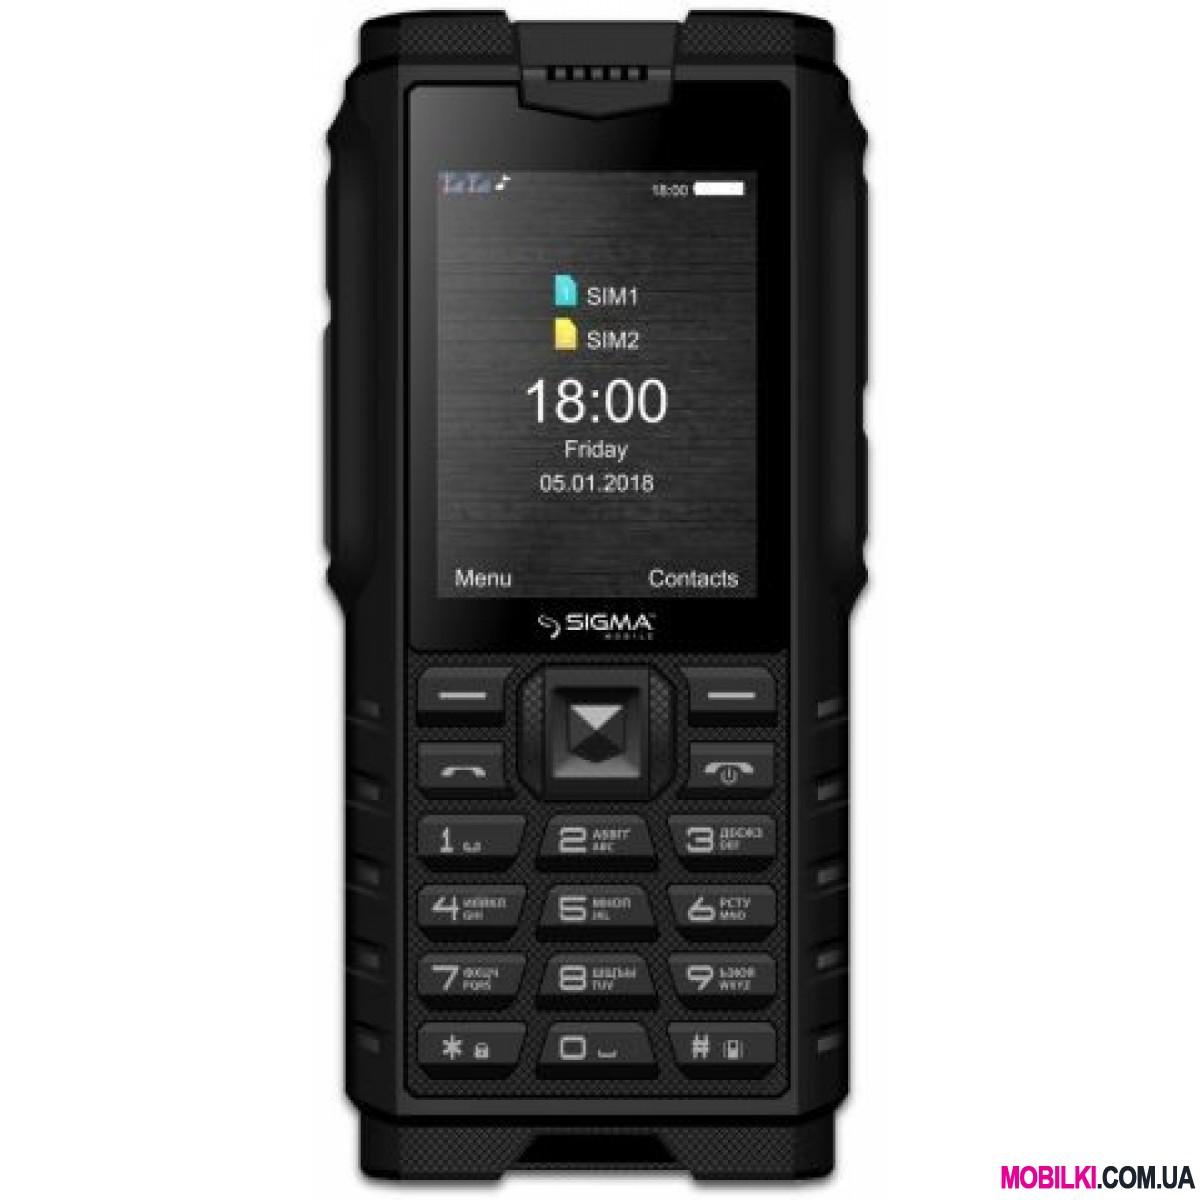 Sigma mobile X-treme DZ68